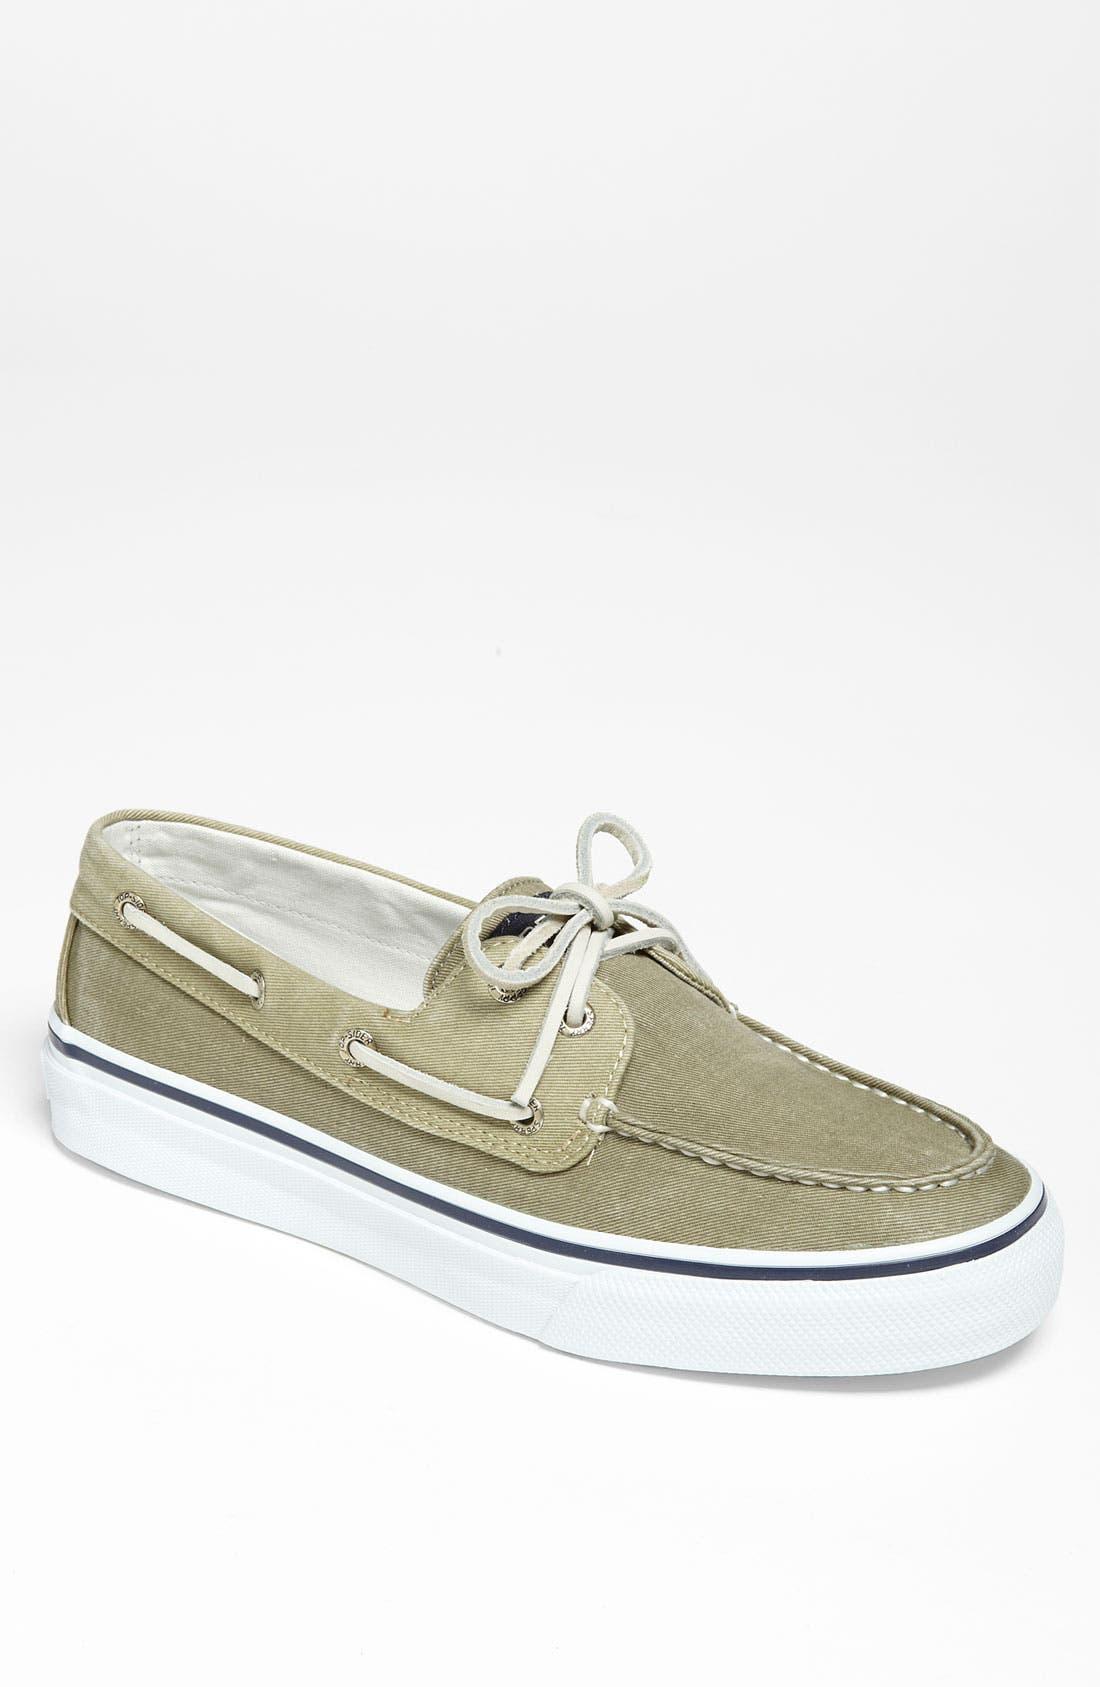 Top-Sider<sup>®</sup> 'Bahama' Boat Shoe,                         Main,                         color, 246